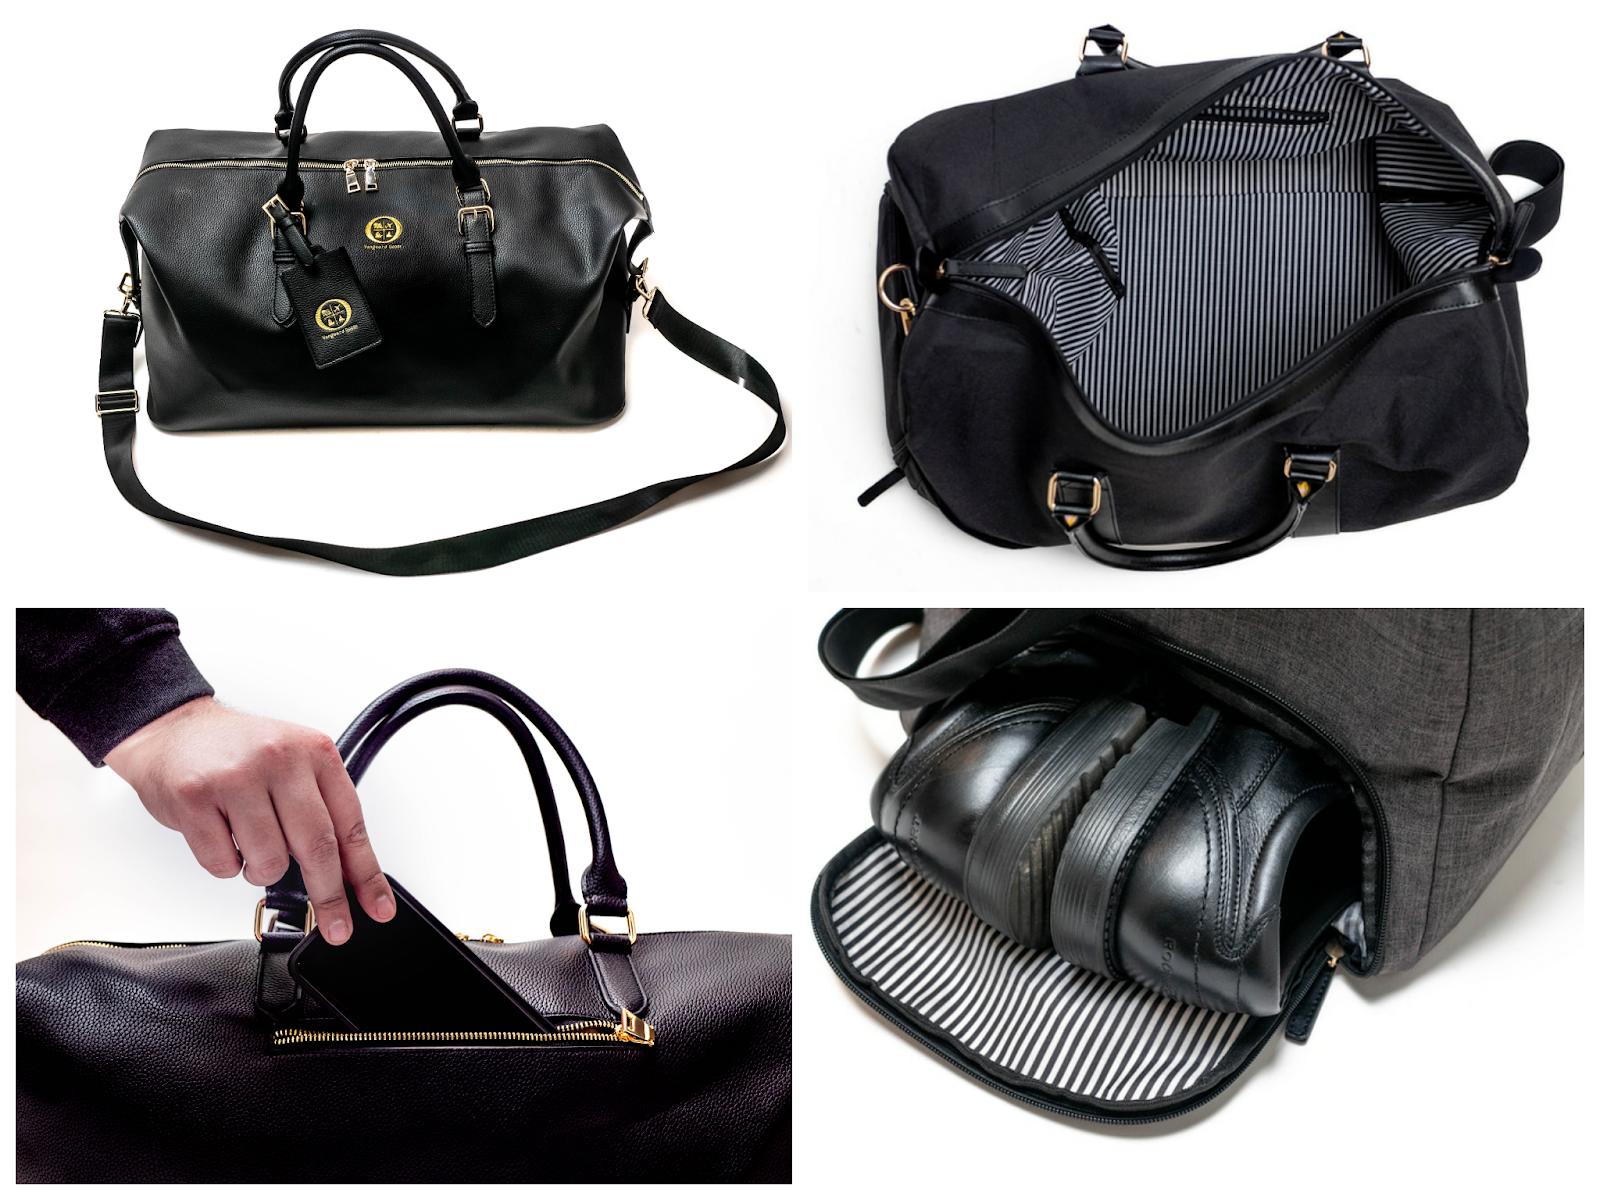 The Winston duffel bag